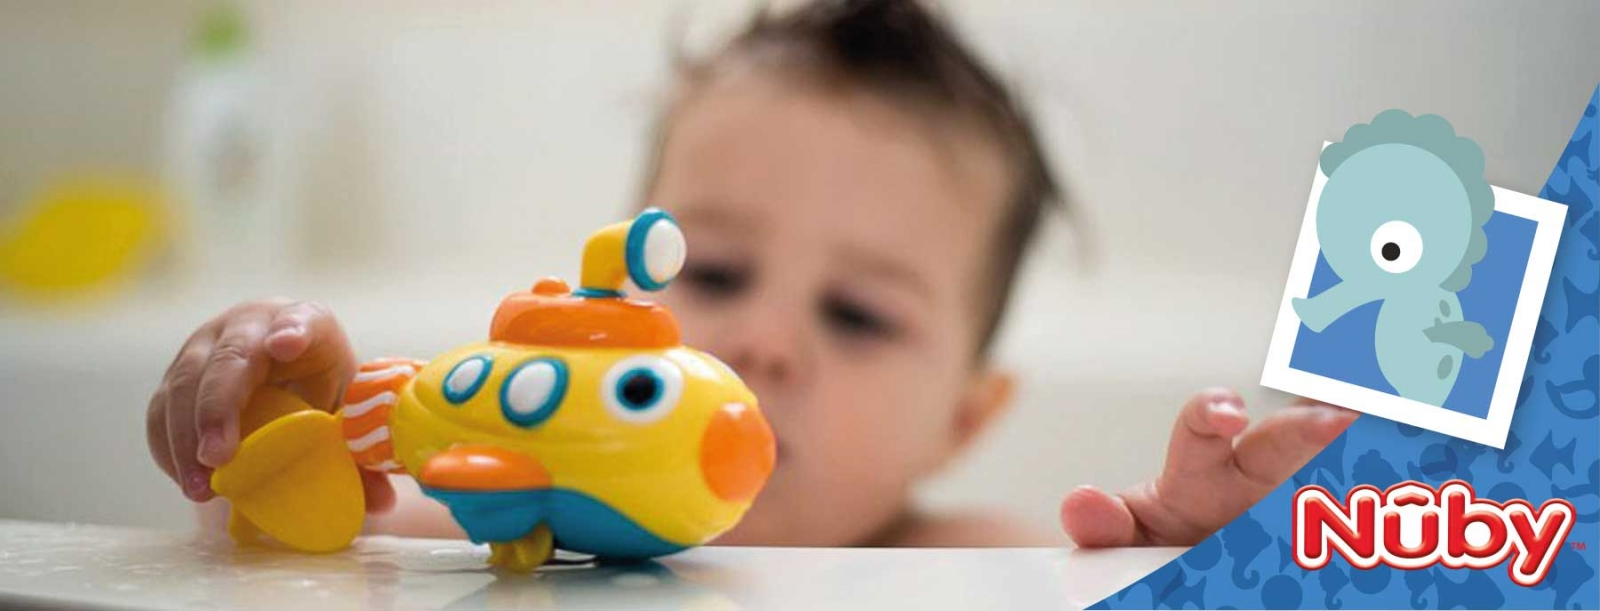 Bath toys for every age - blog - Nuby™